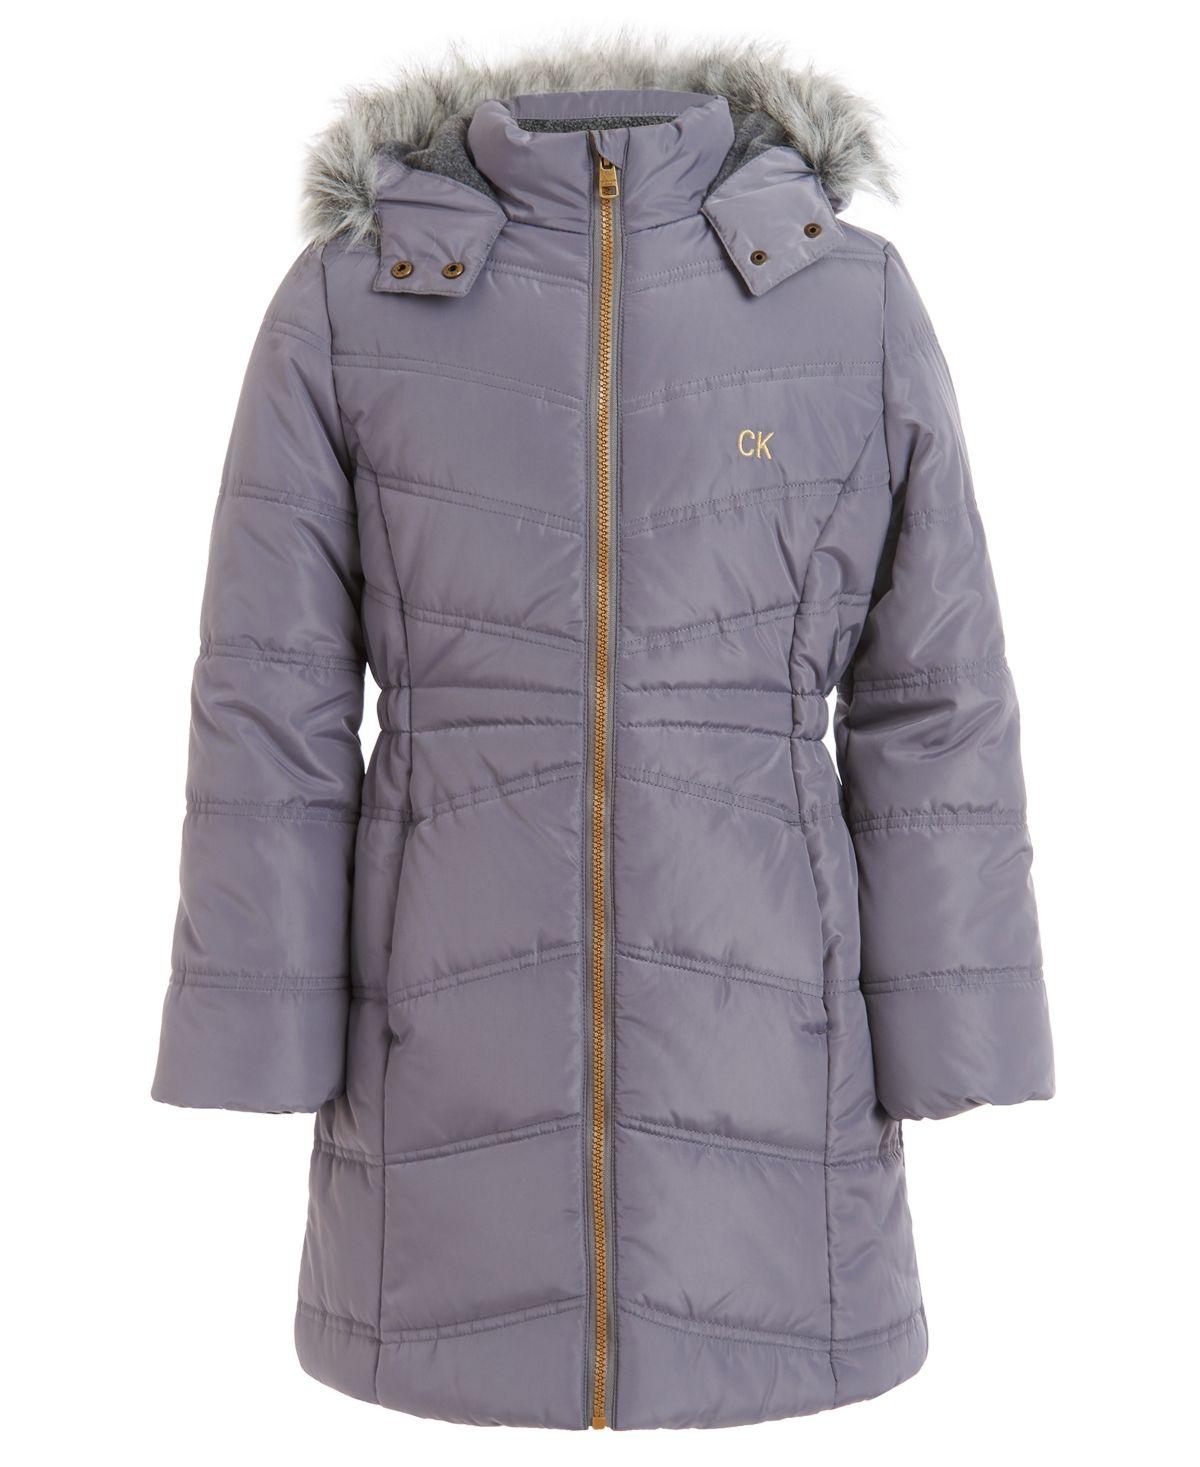 Calvin Klein Toddler Girls Aerial Hooded Jacket Dark Grey In 2021 Calvin Klein Girls Kids Coats Girls Puffer Coat [ 1467 x 1200 Pixel ]